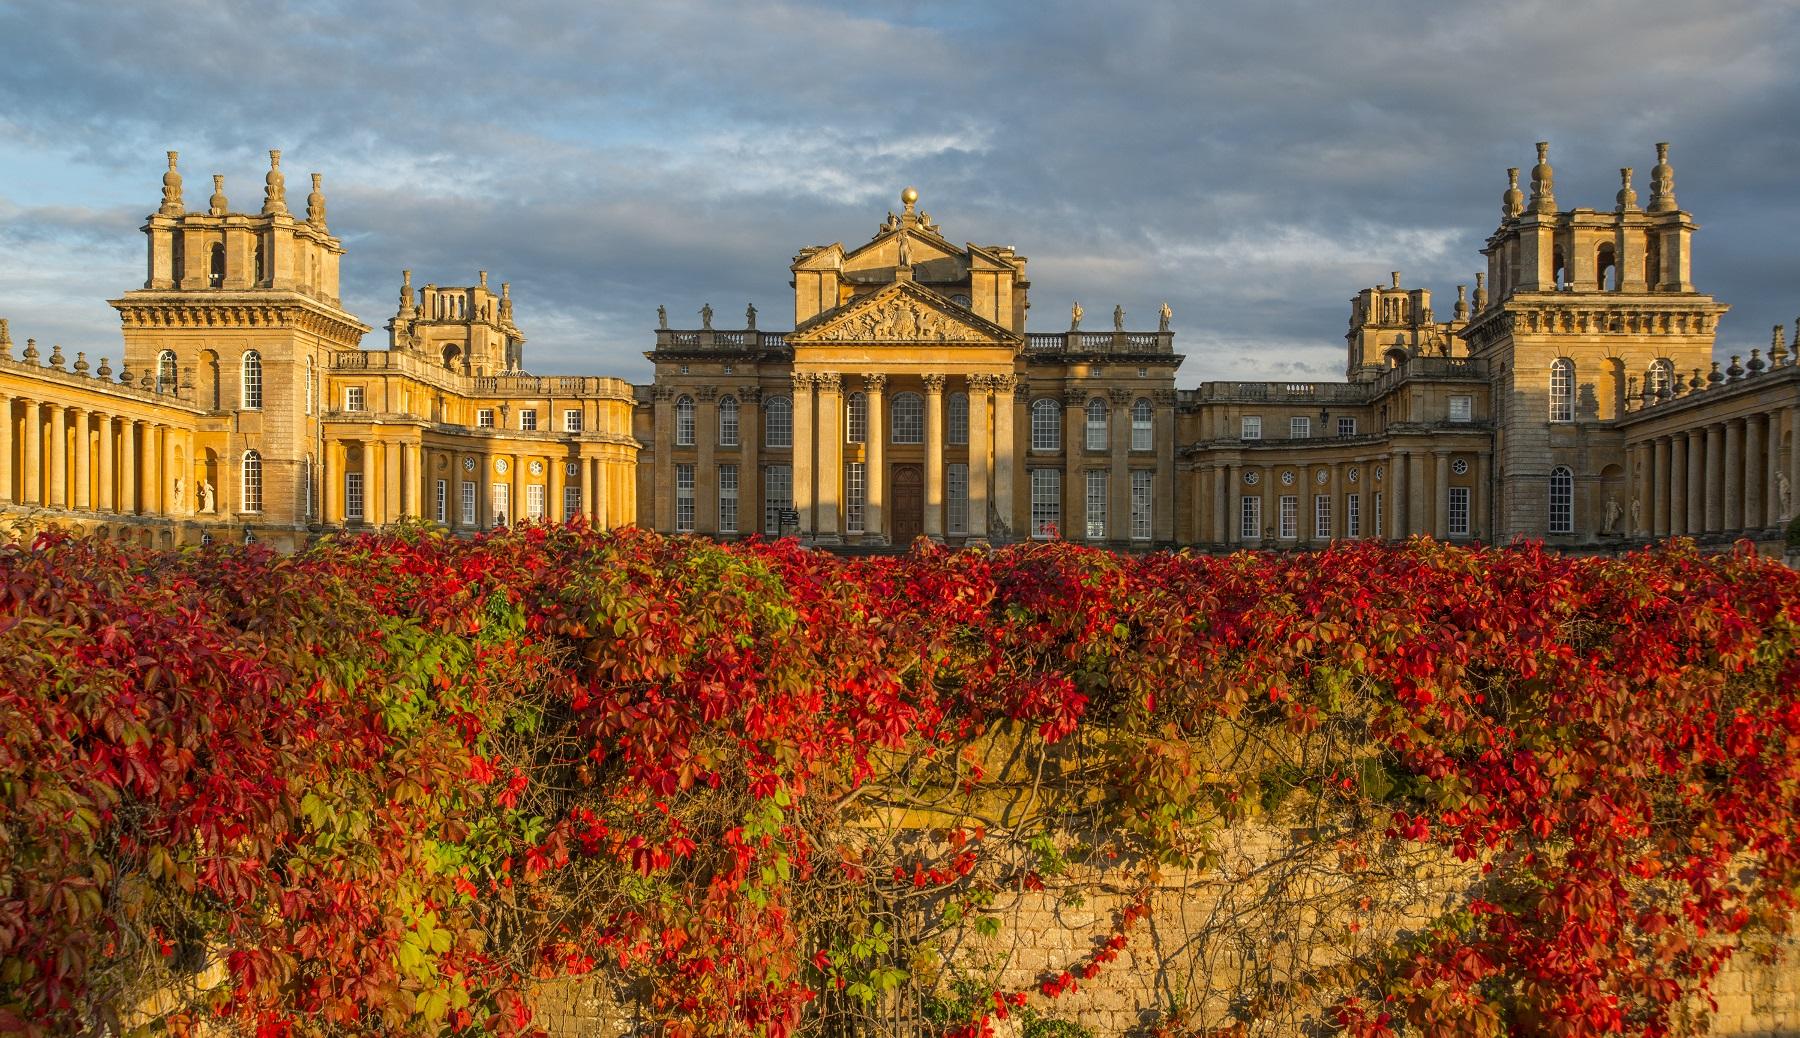 Autumnal colours at Blenheim Palace